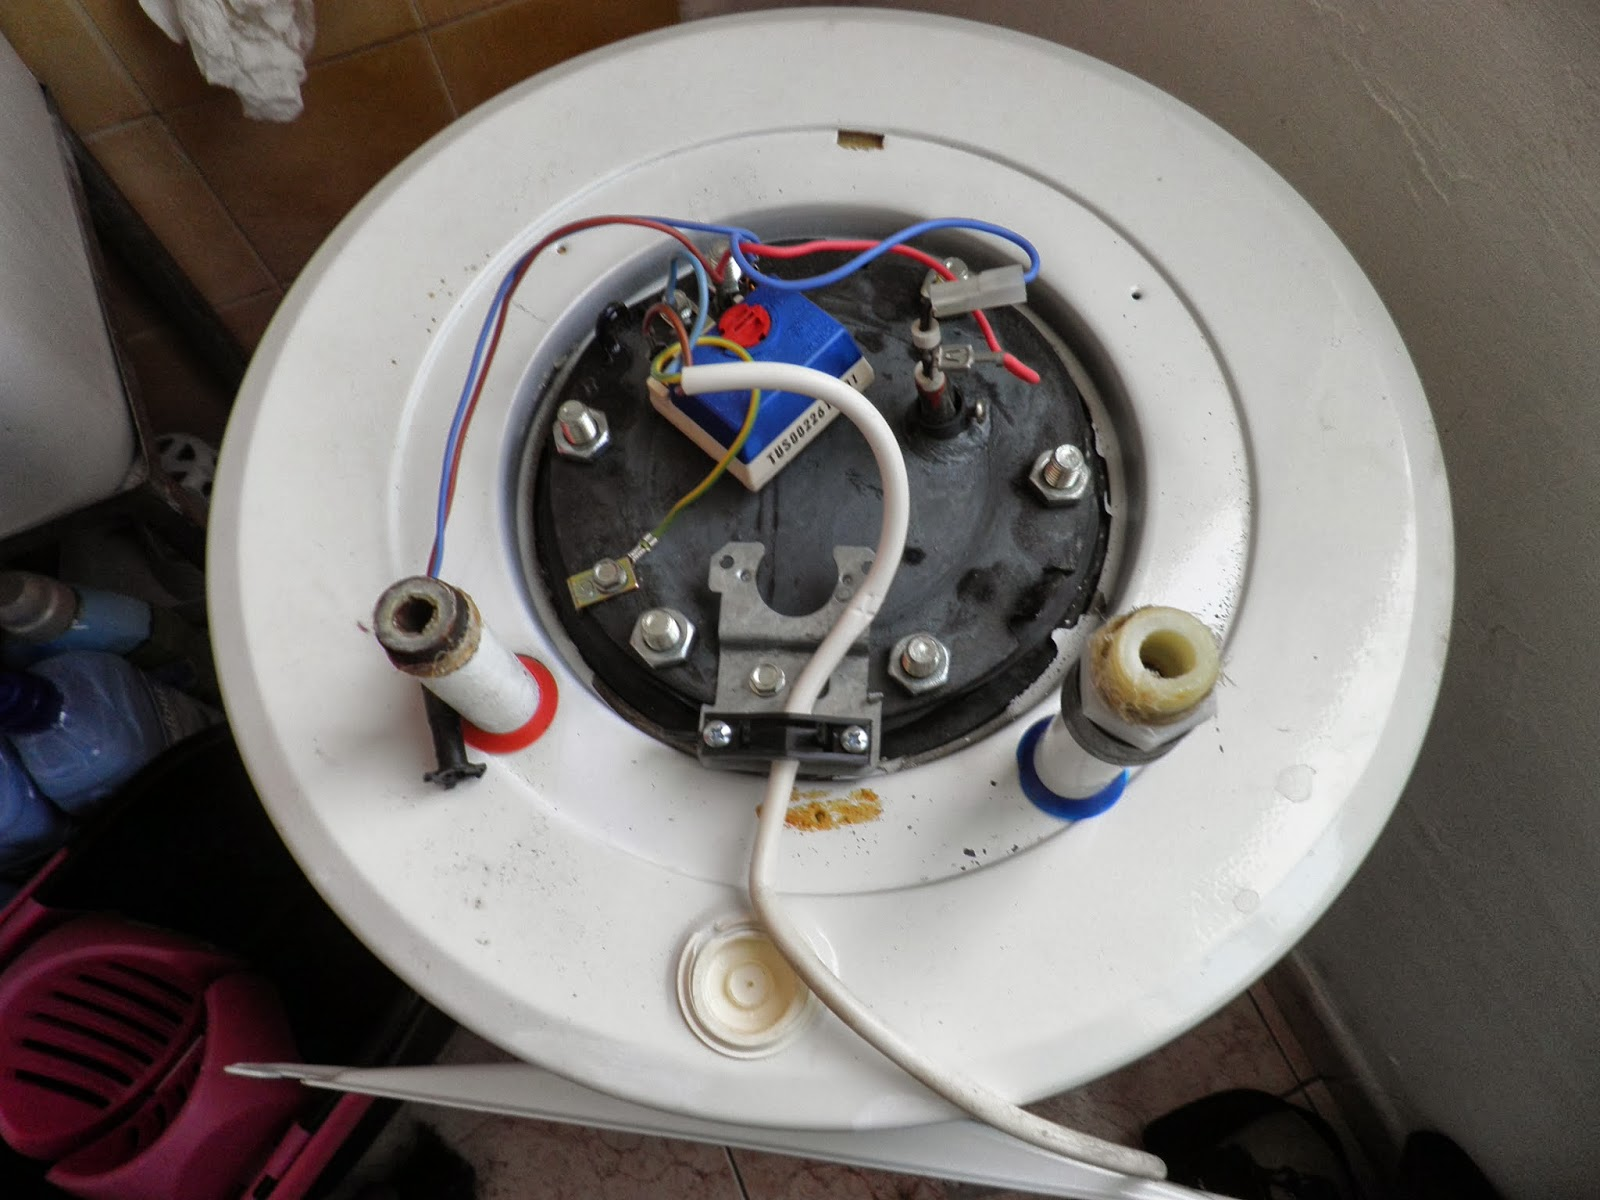 Como limpiar un termo electrico rpmsierradecor - Acumulador de agua electrico ...